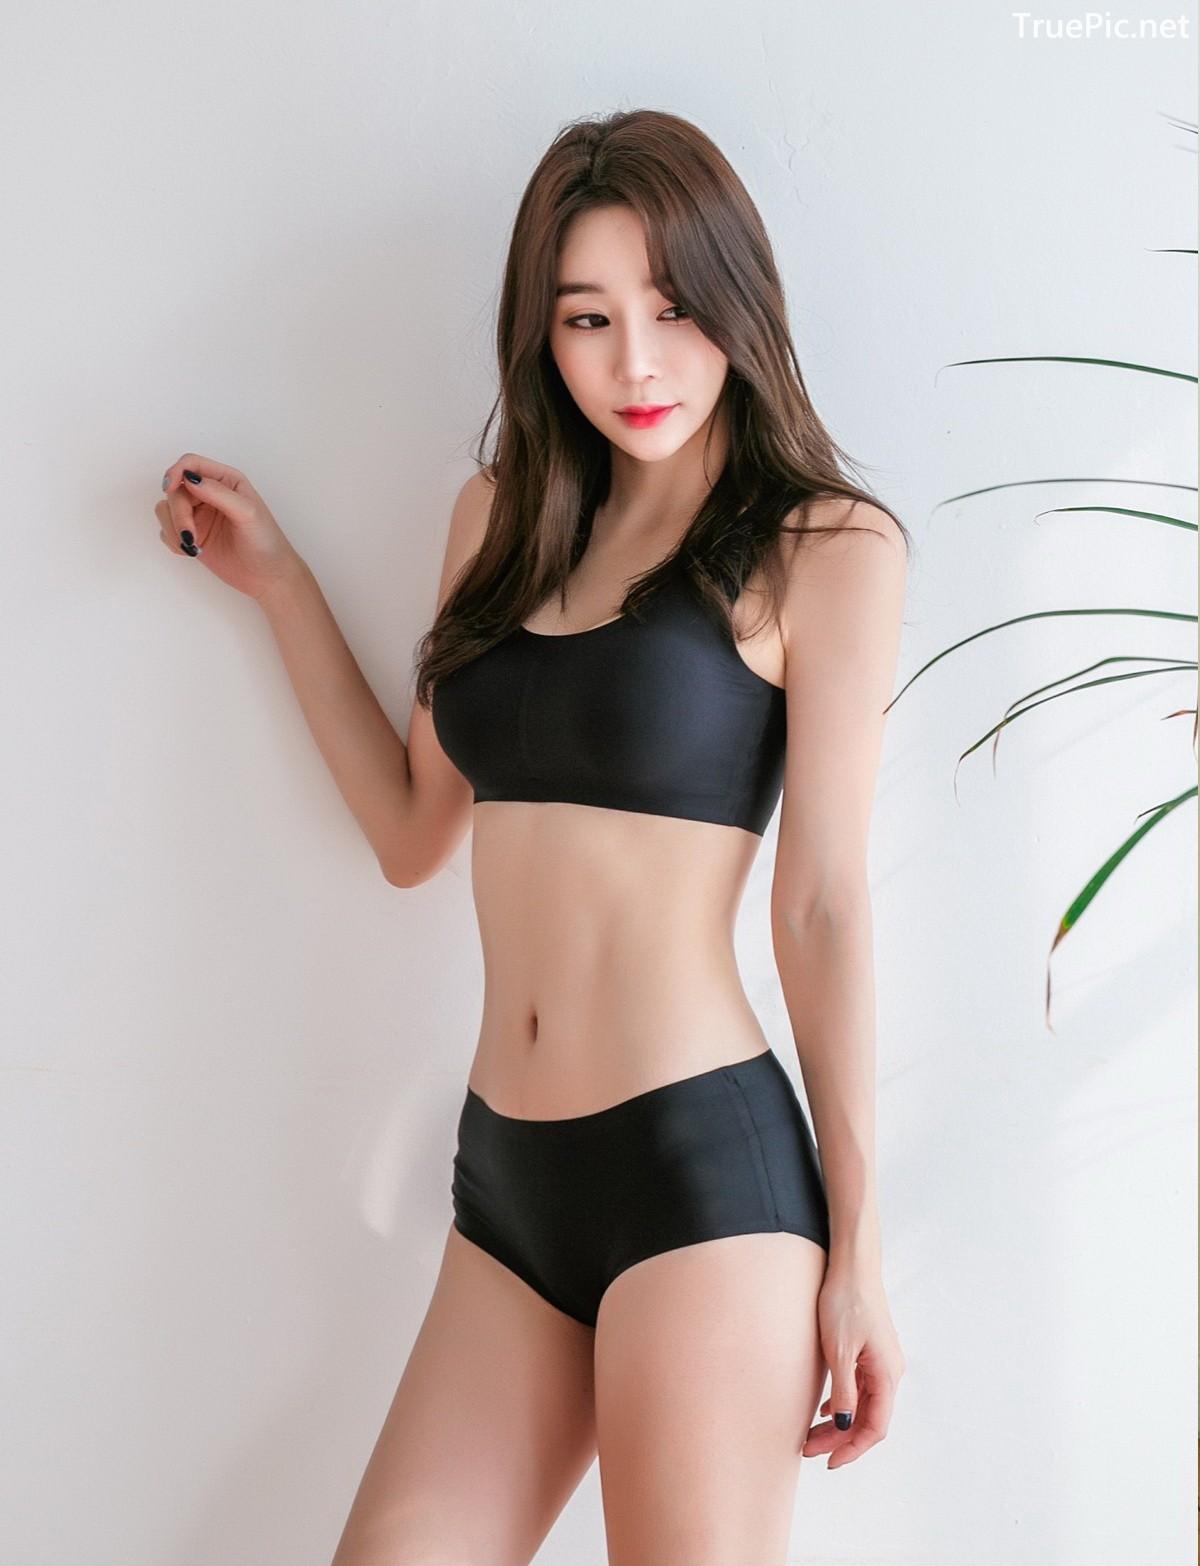 Image Korean Fashion Model - Hyun Kyung - Black Tube Lingerie - TruePic.net - Picture-1